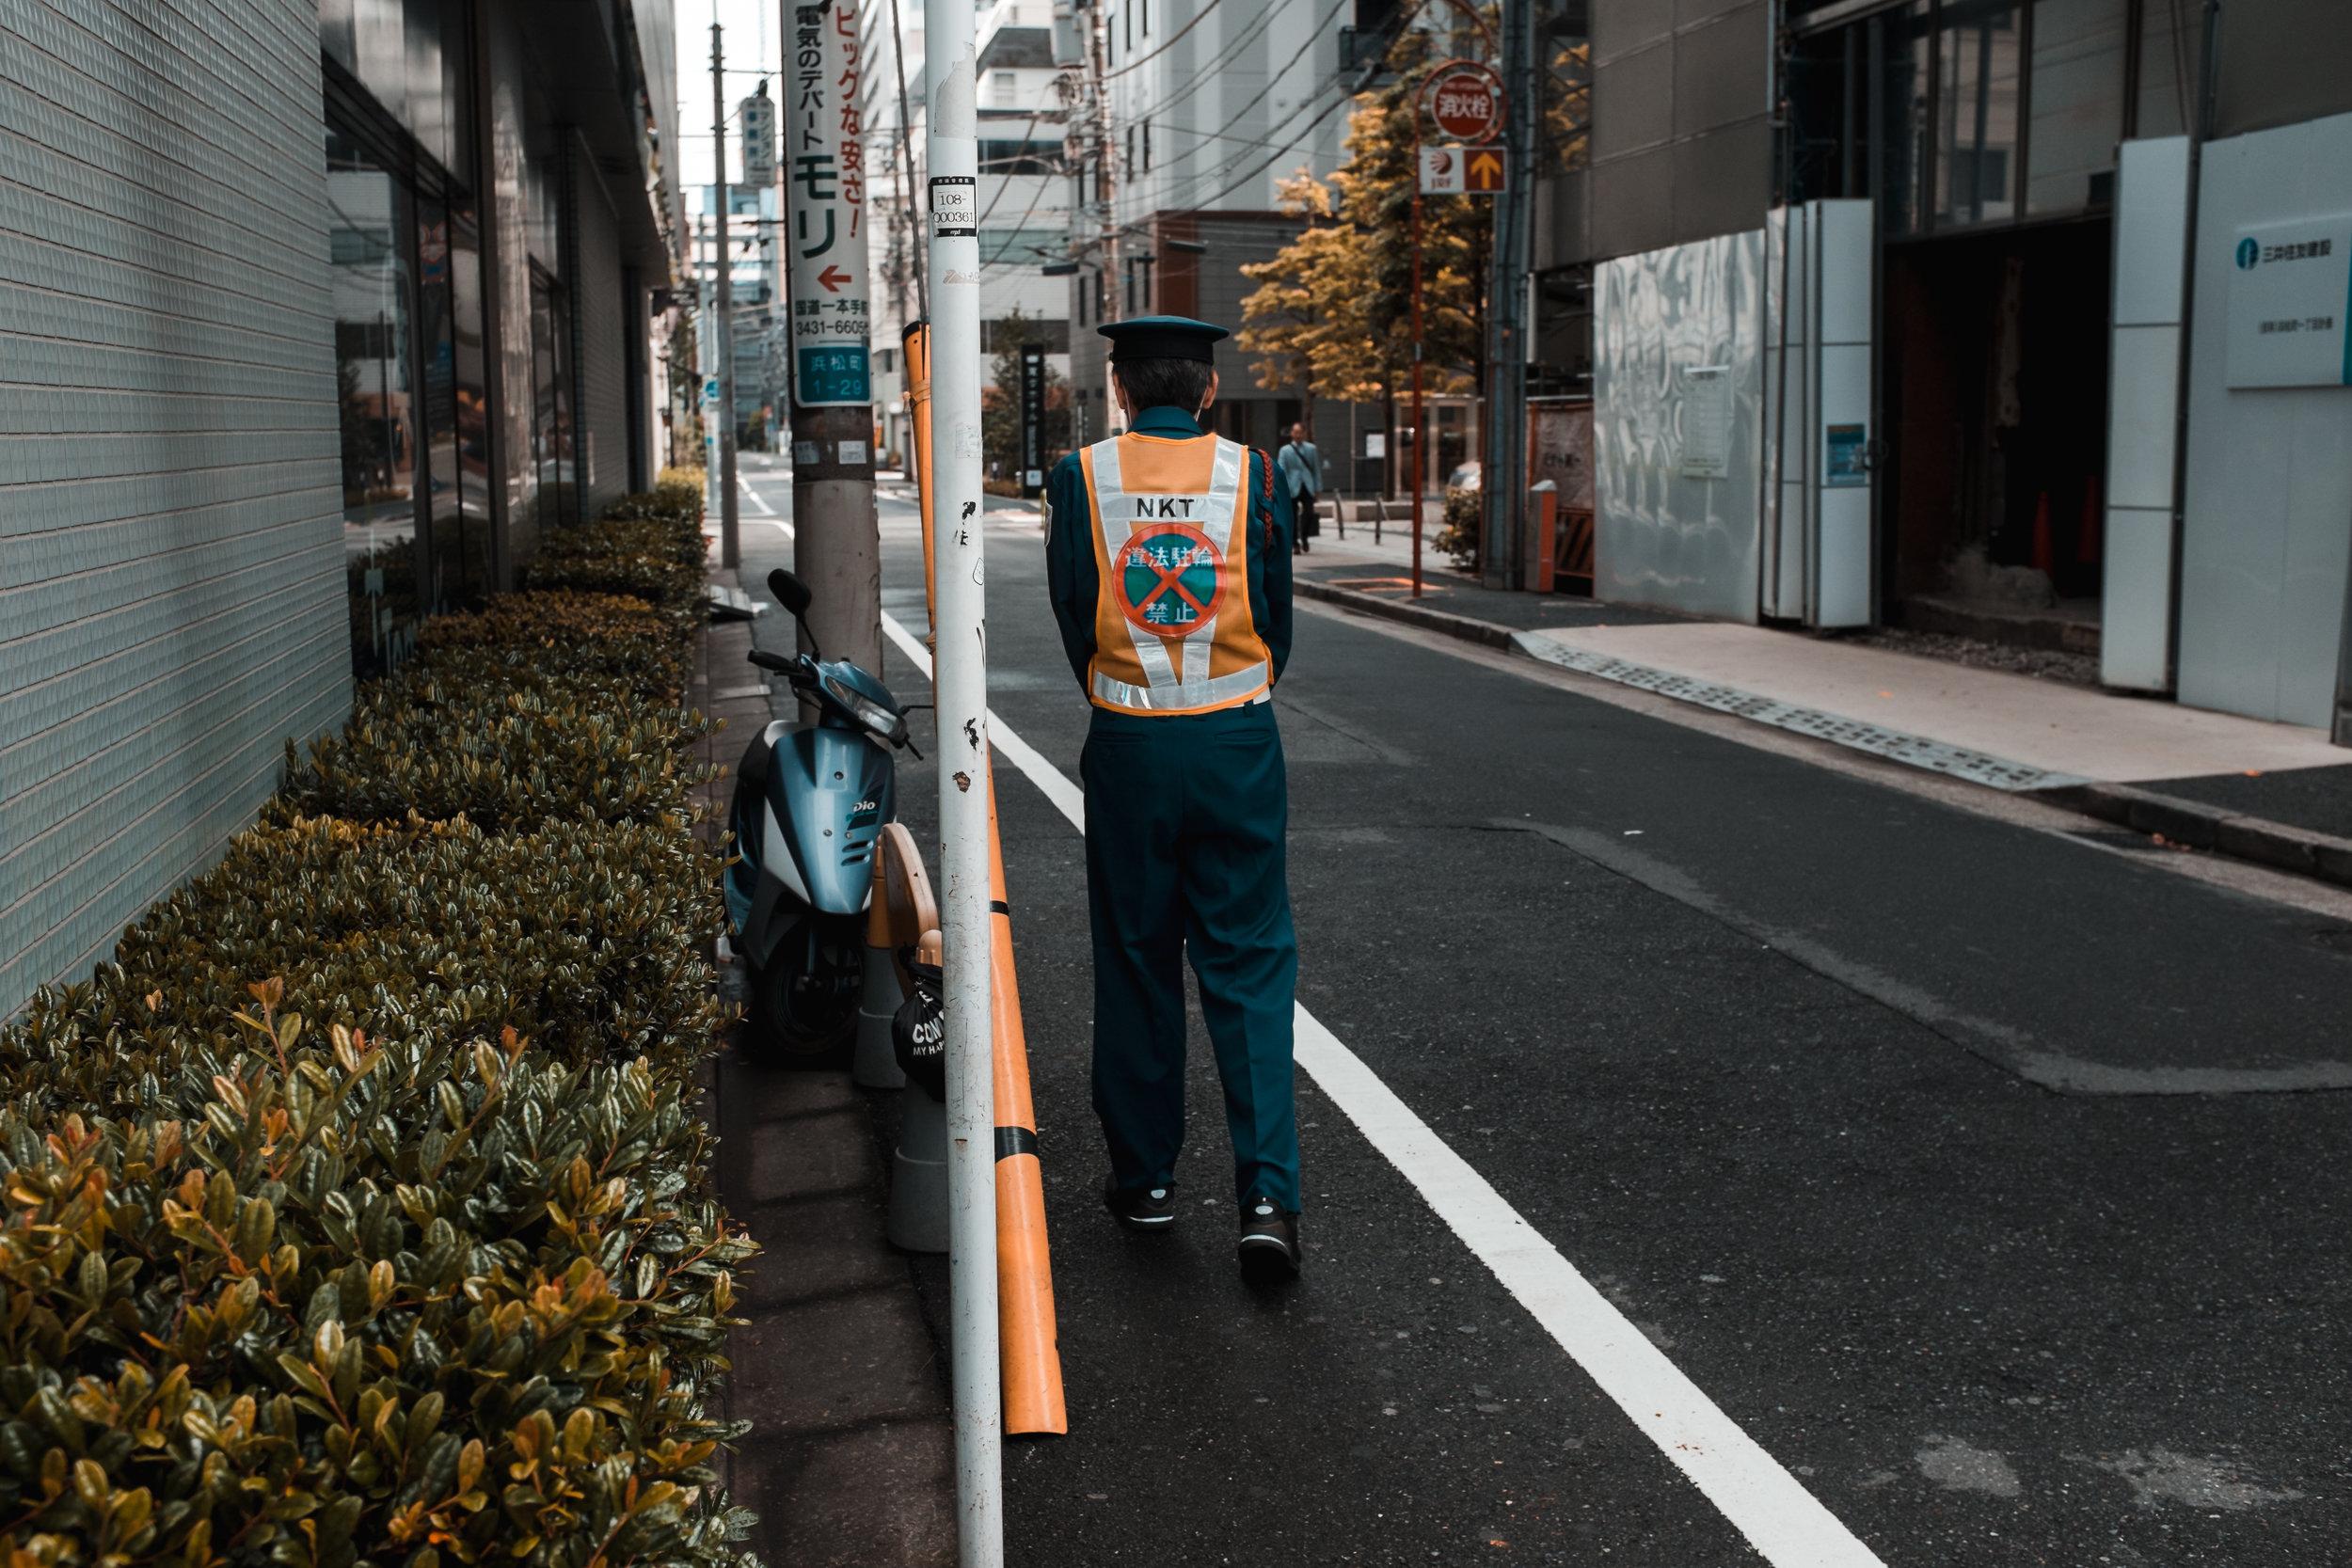 TokyoJapan_2018_AdamDillon_DSCF9041.jpg